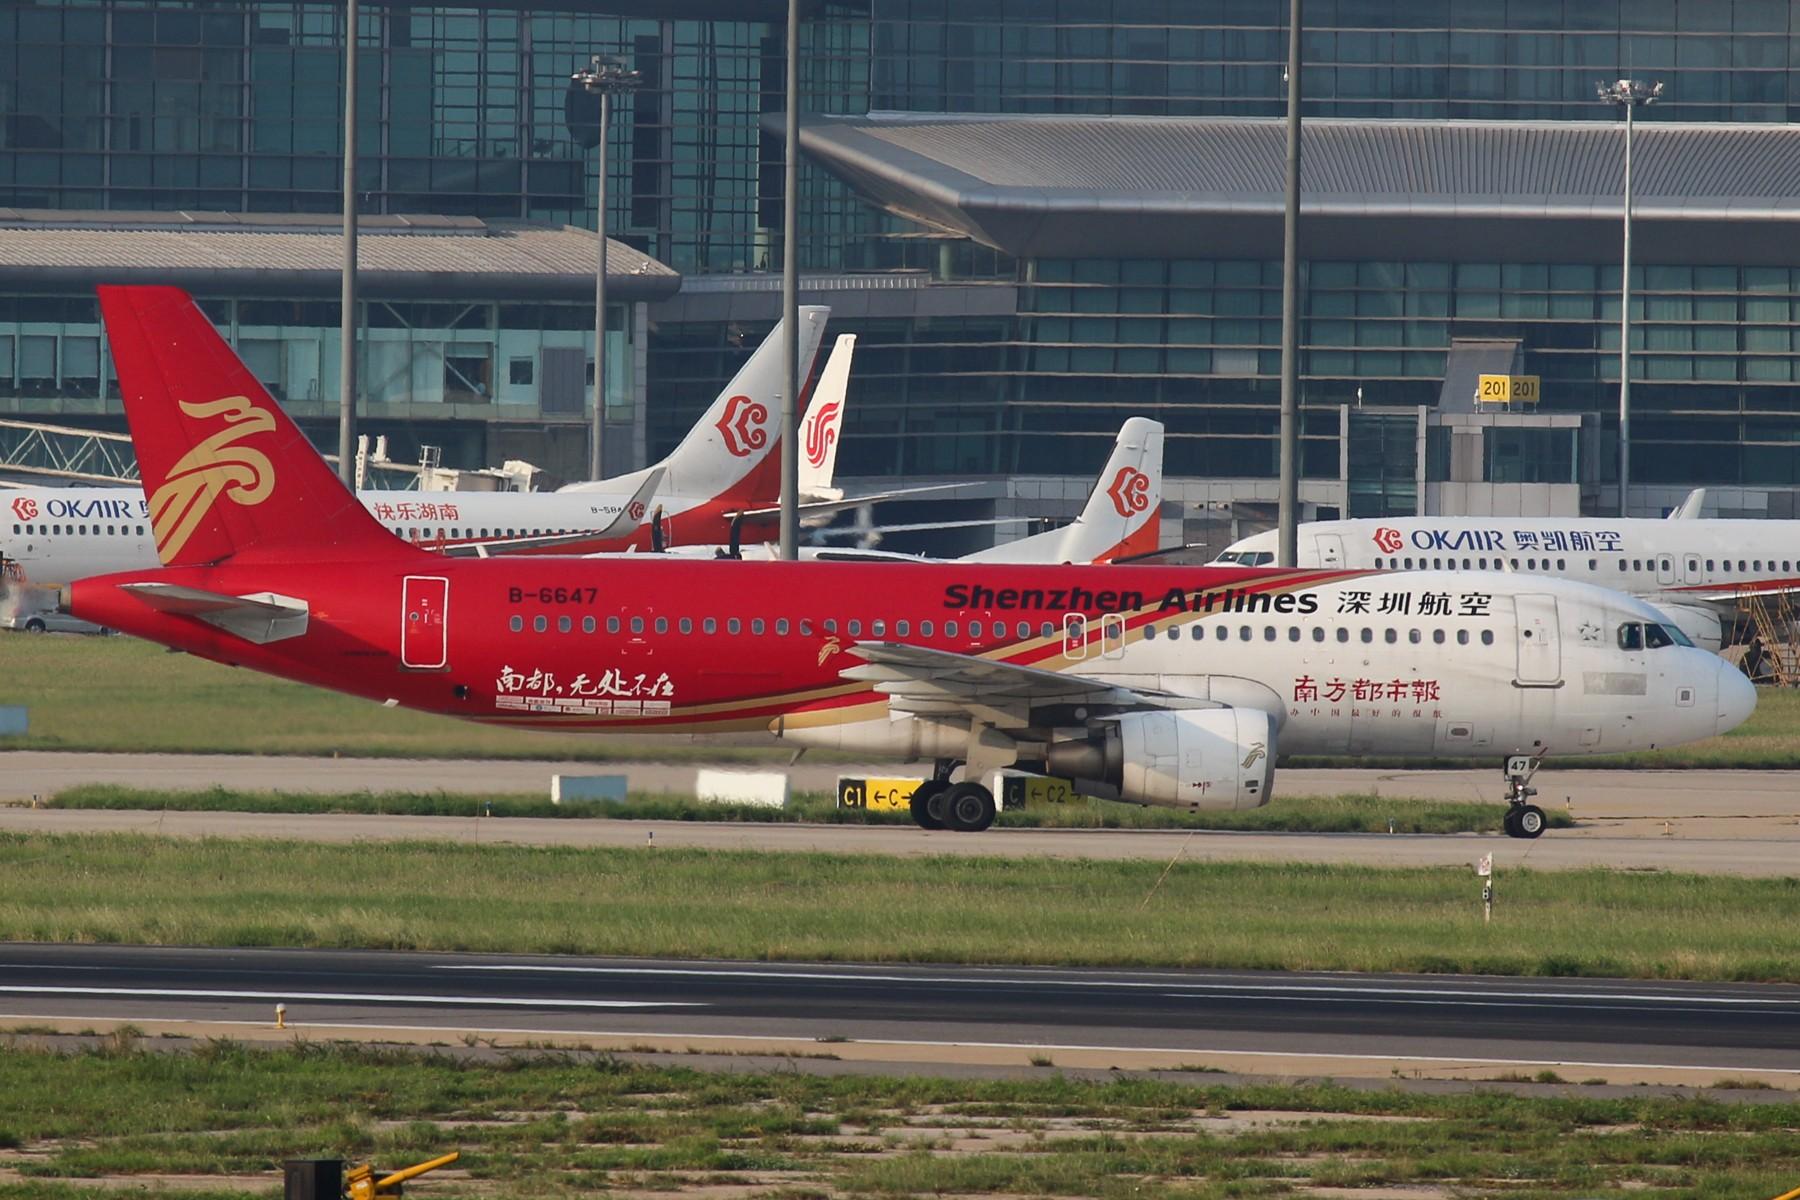 Re:[原创]【TSN拍机帖】1800*1200大图 13pics AIRBUS A320-200 B-6647 中国天津滨海国际机场